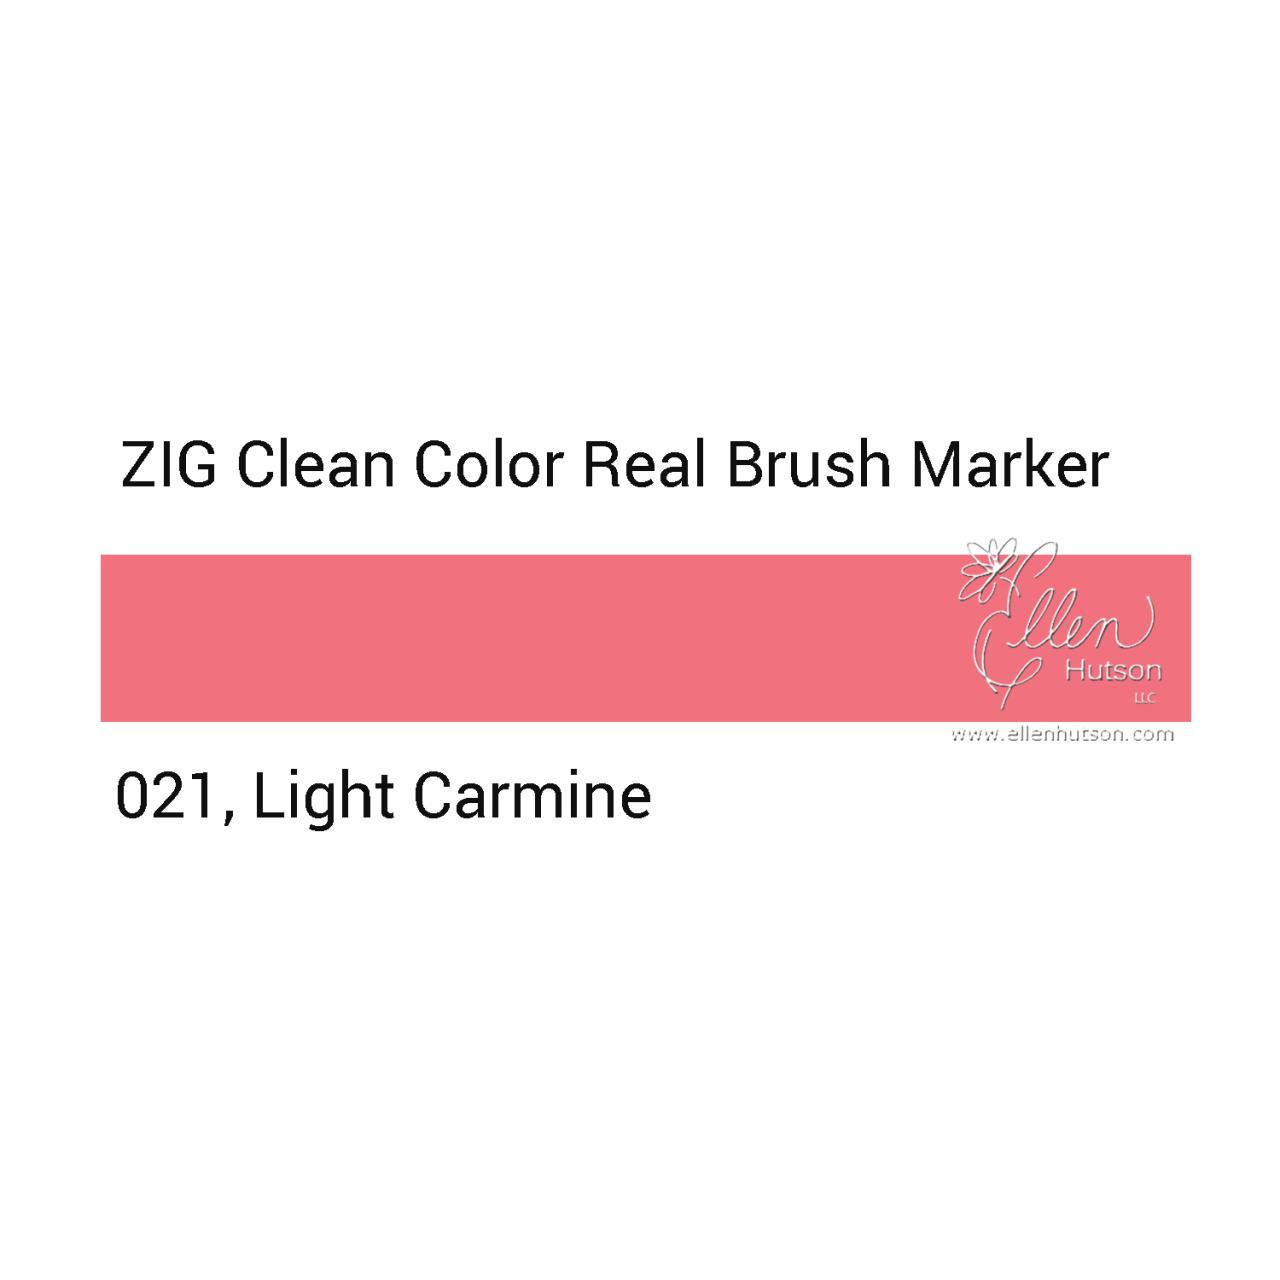 021 - Light Carmine, ZIG Clean Color Real Brush Marker -